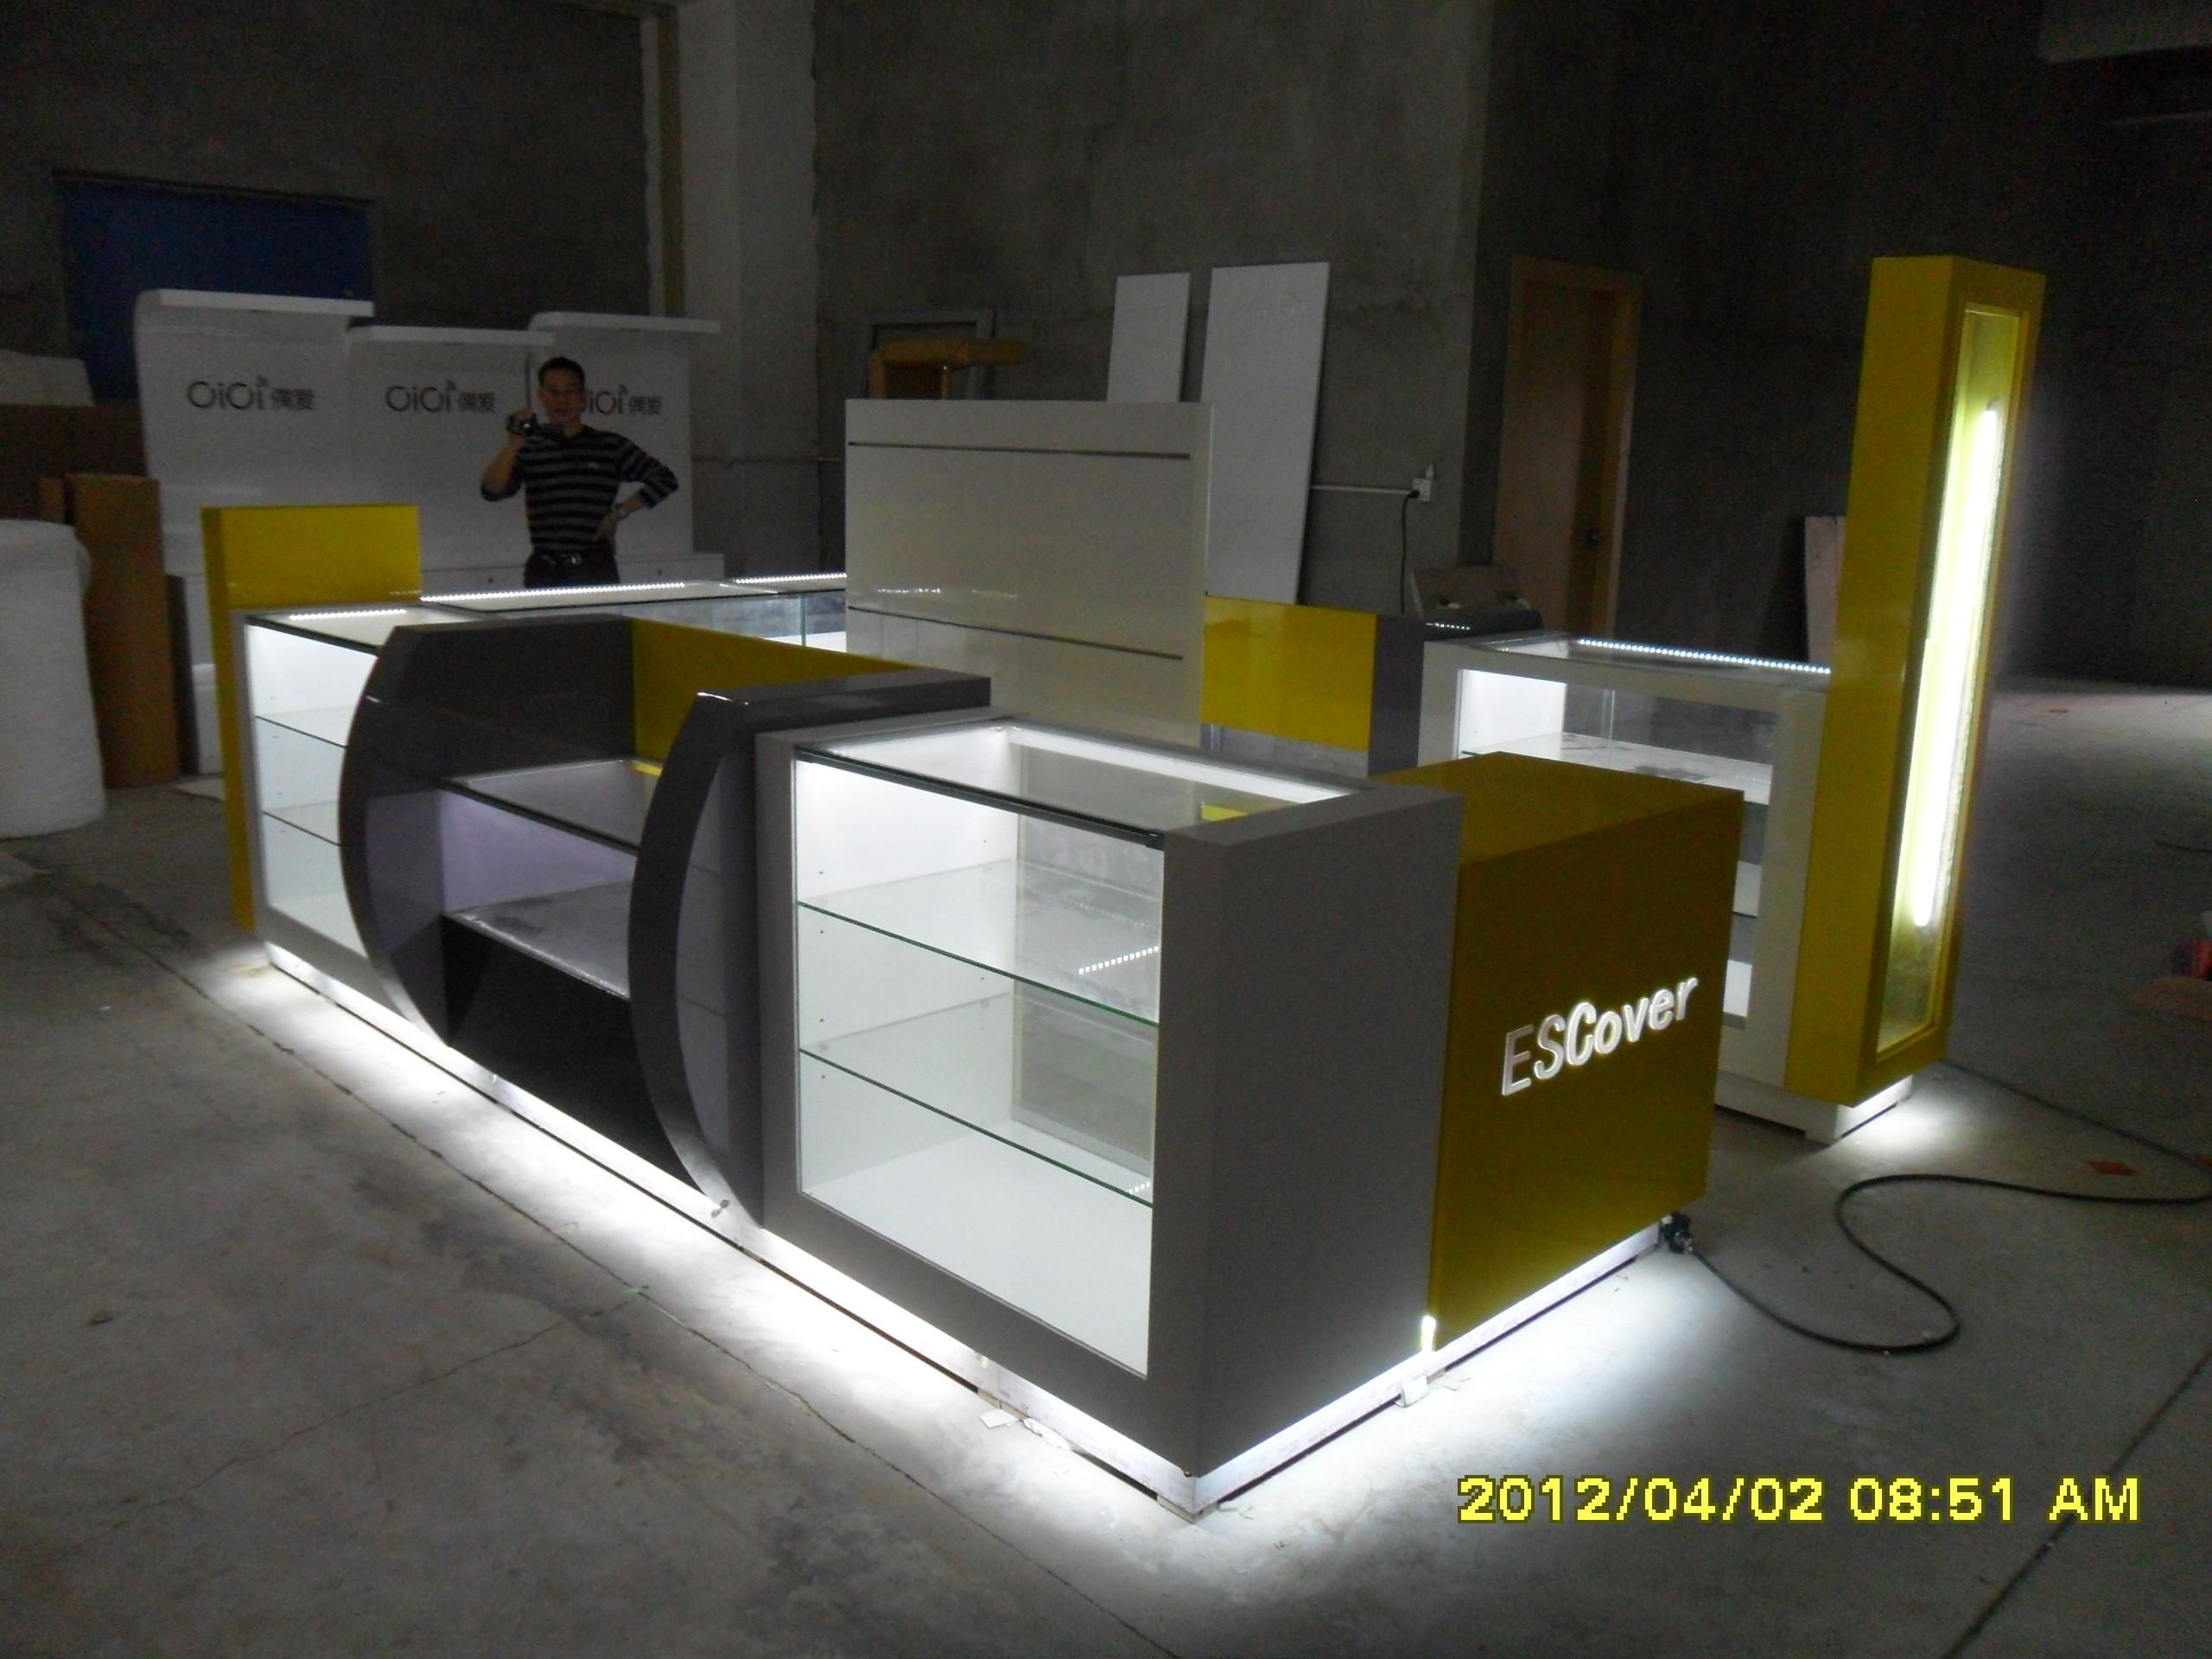 Mobile Phone Shop Furniture Design Mobile phone shop furn...